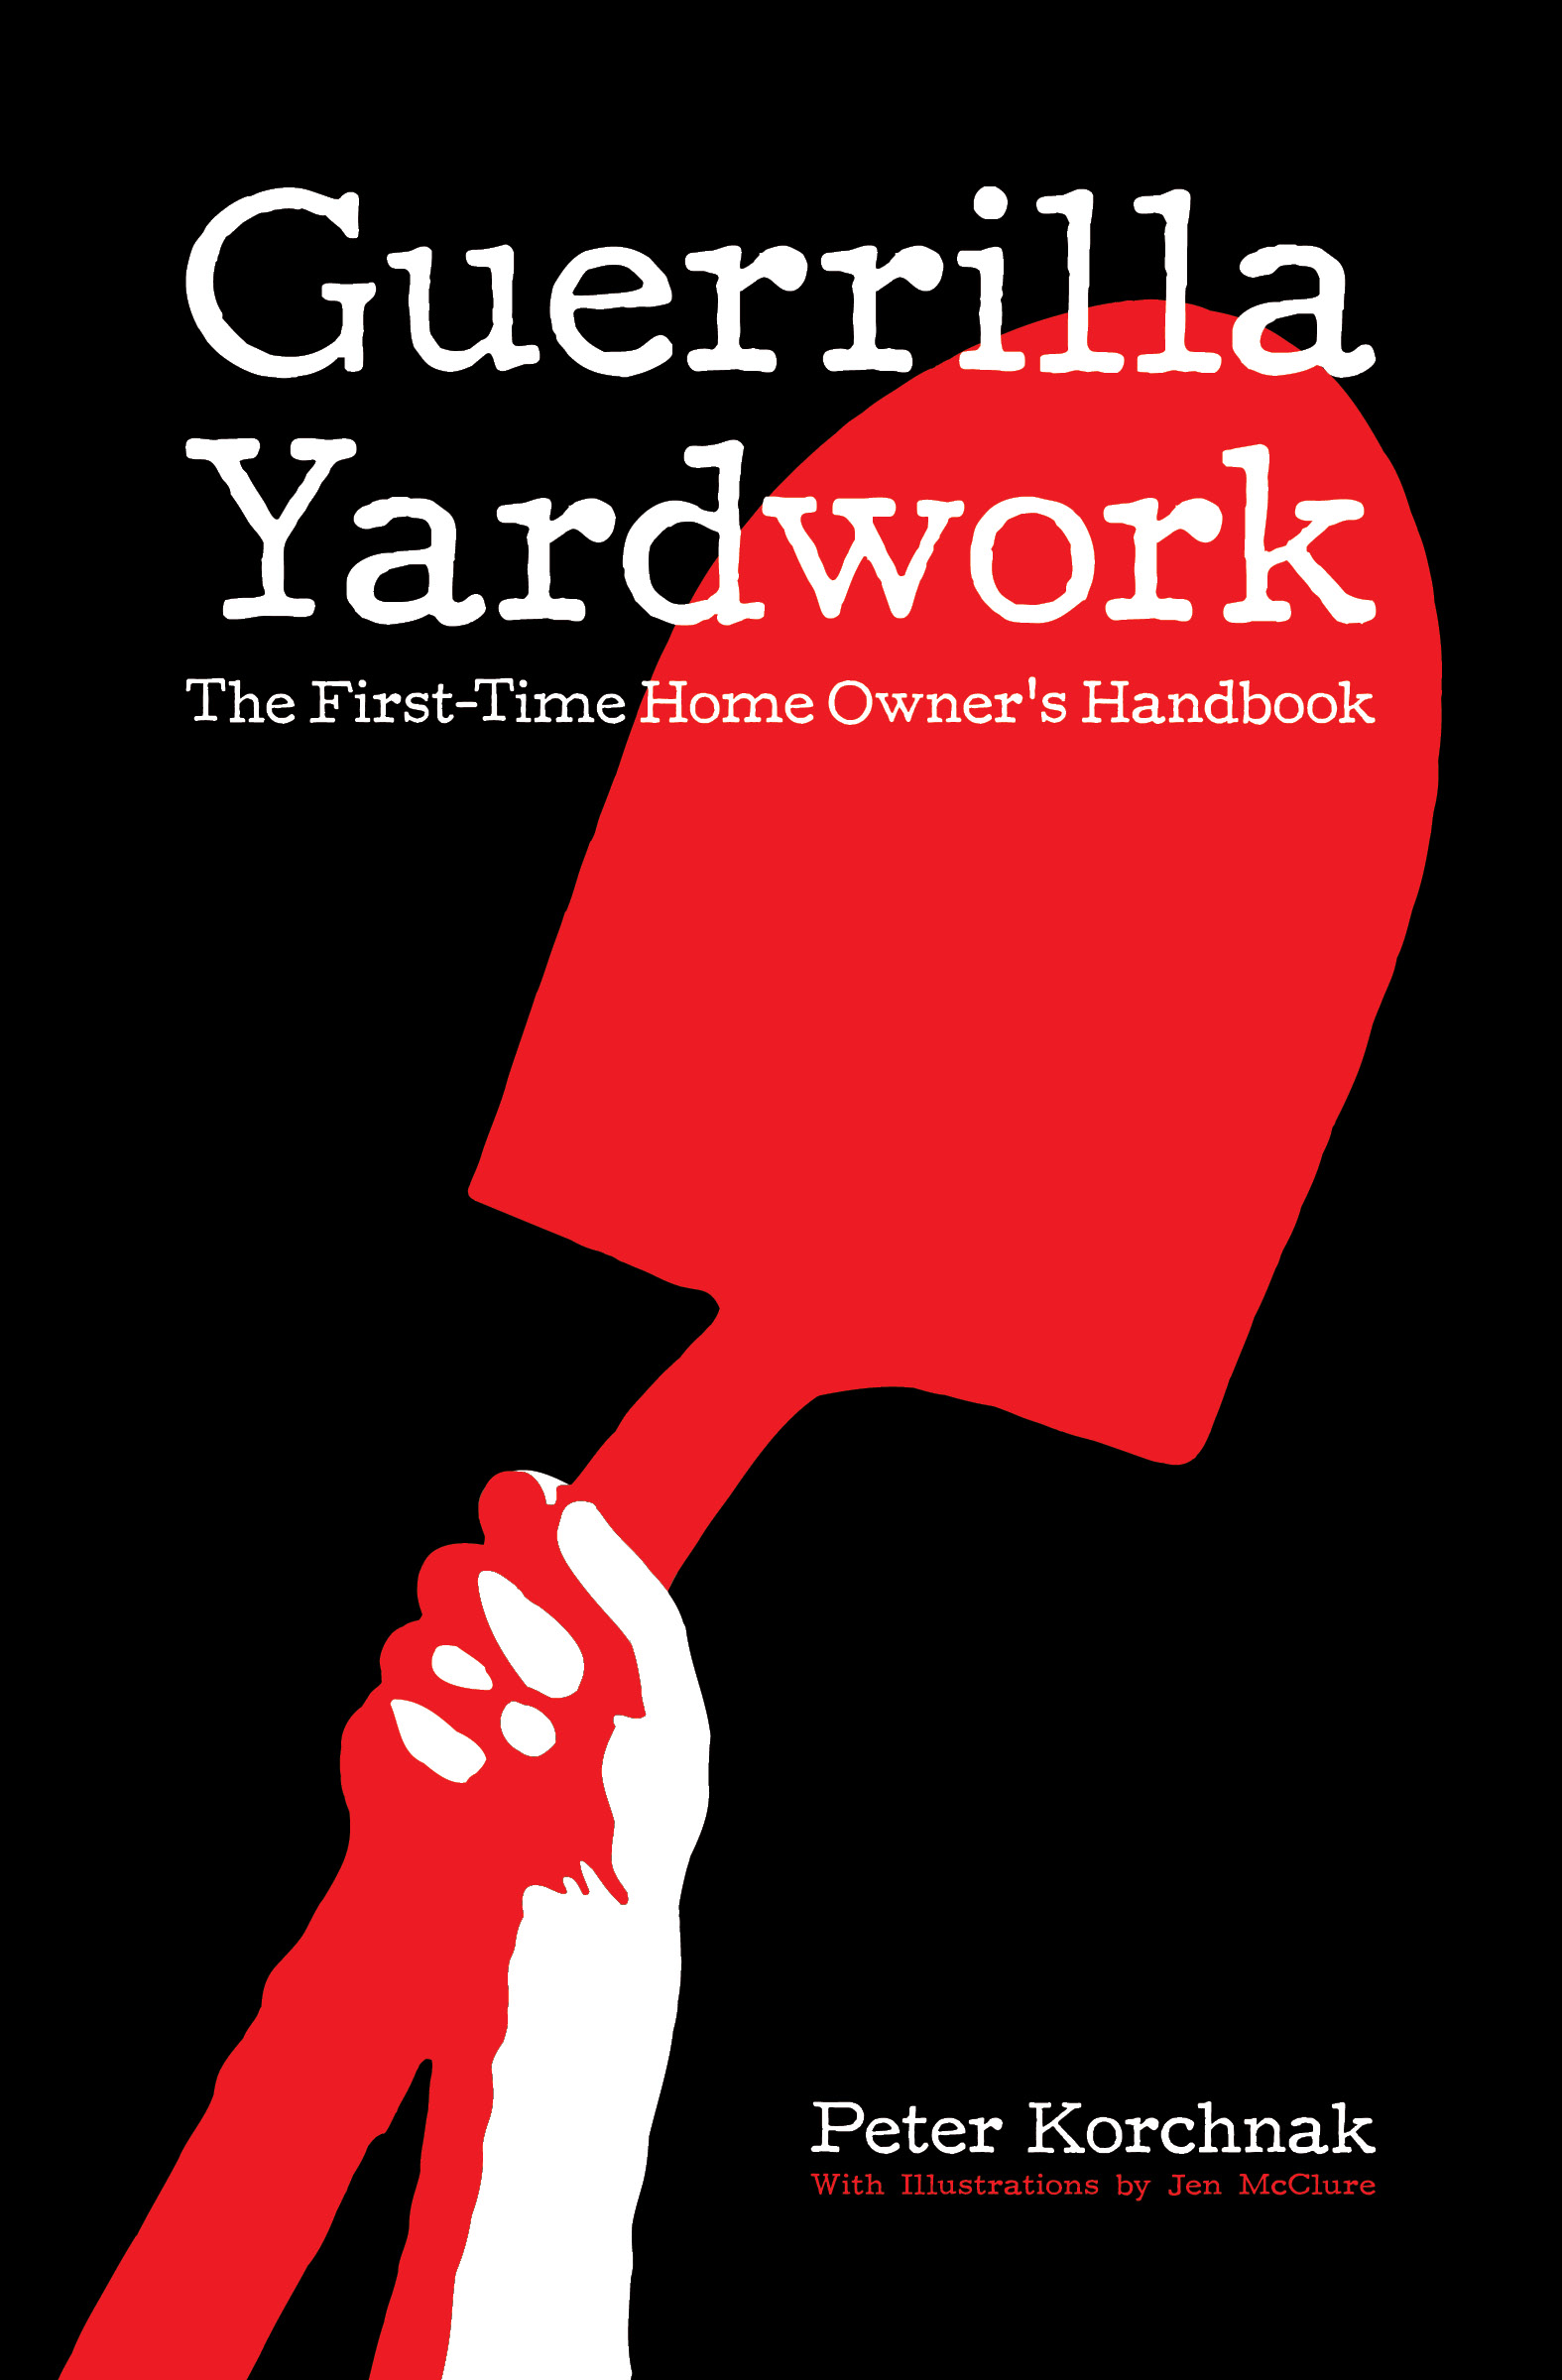 Guerrilla Yardwork cover